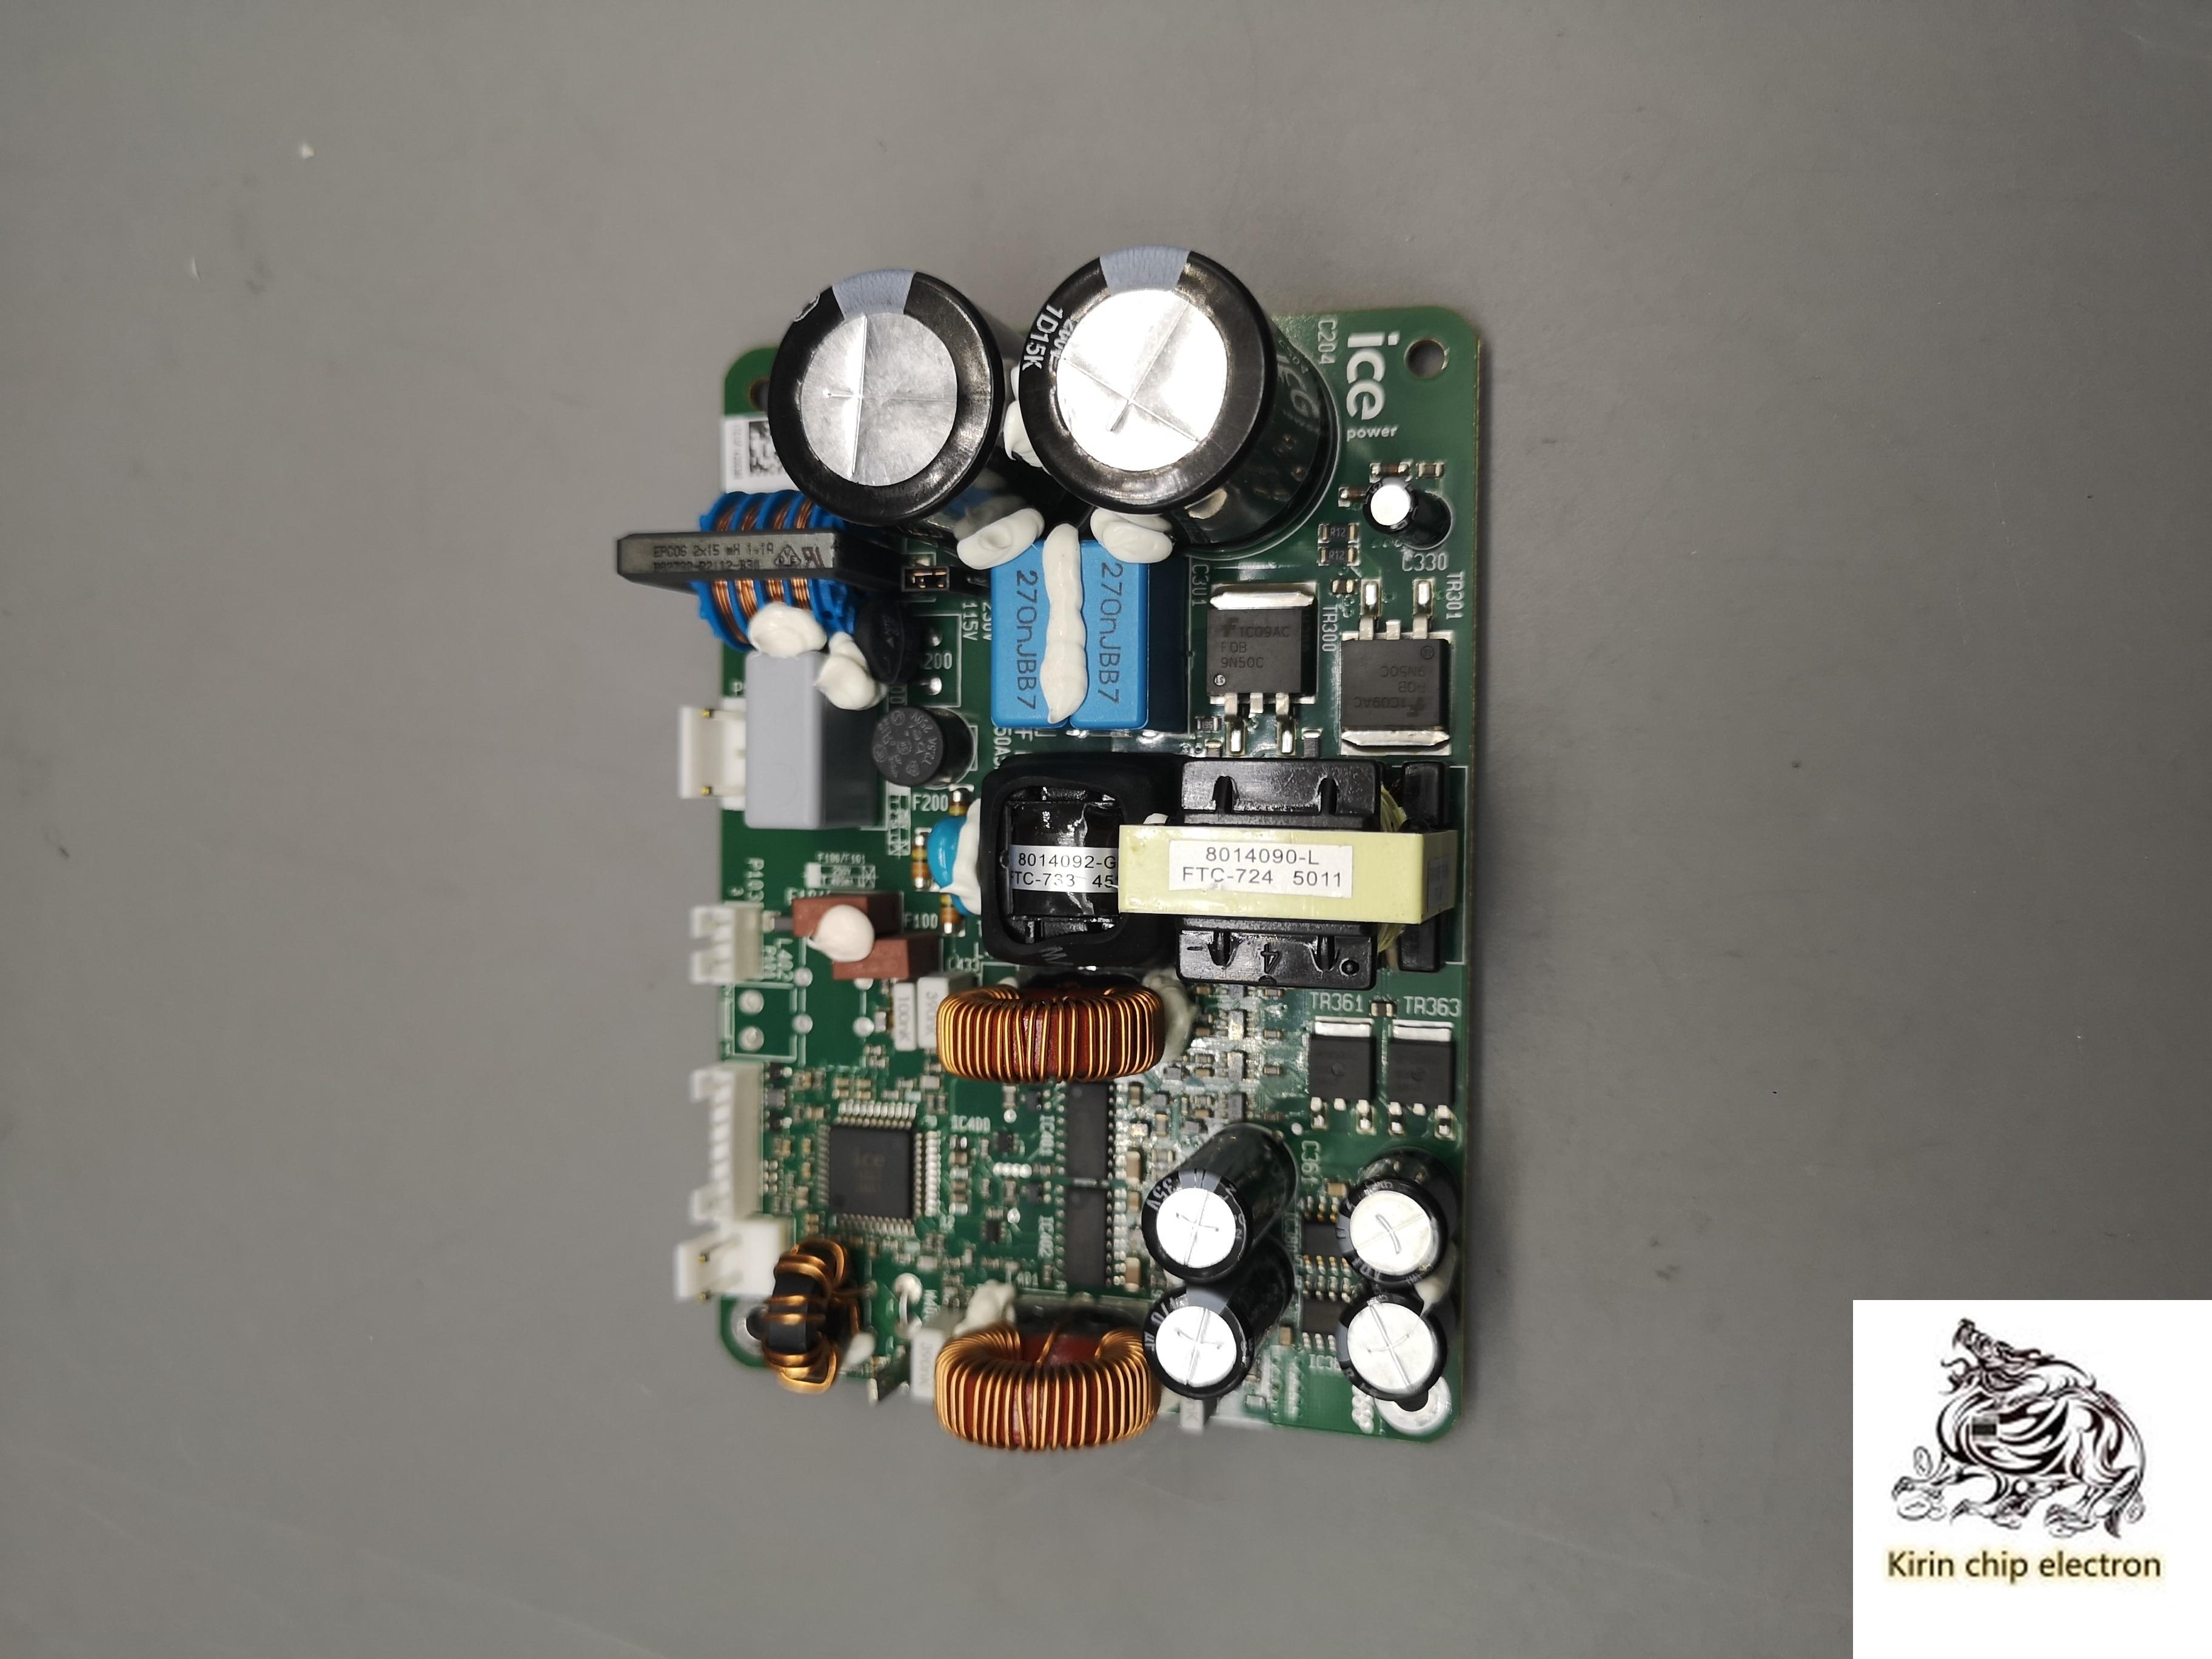 1PCS/LOT Original Genuine ICEPOWER Amplifier Accessories Digital Amplifier Module ICE50ASX2 BTL Fever Amplifier